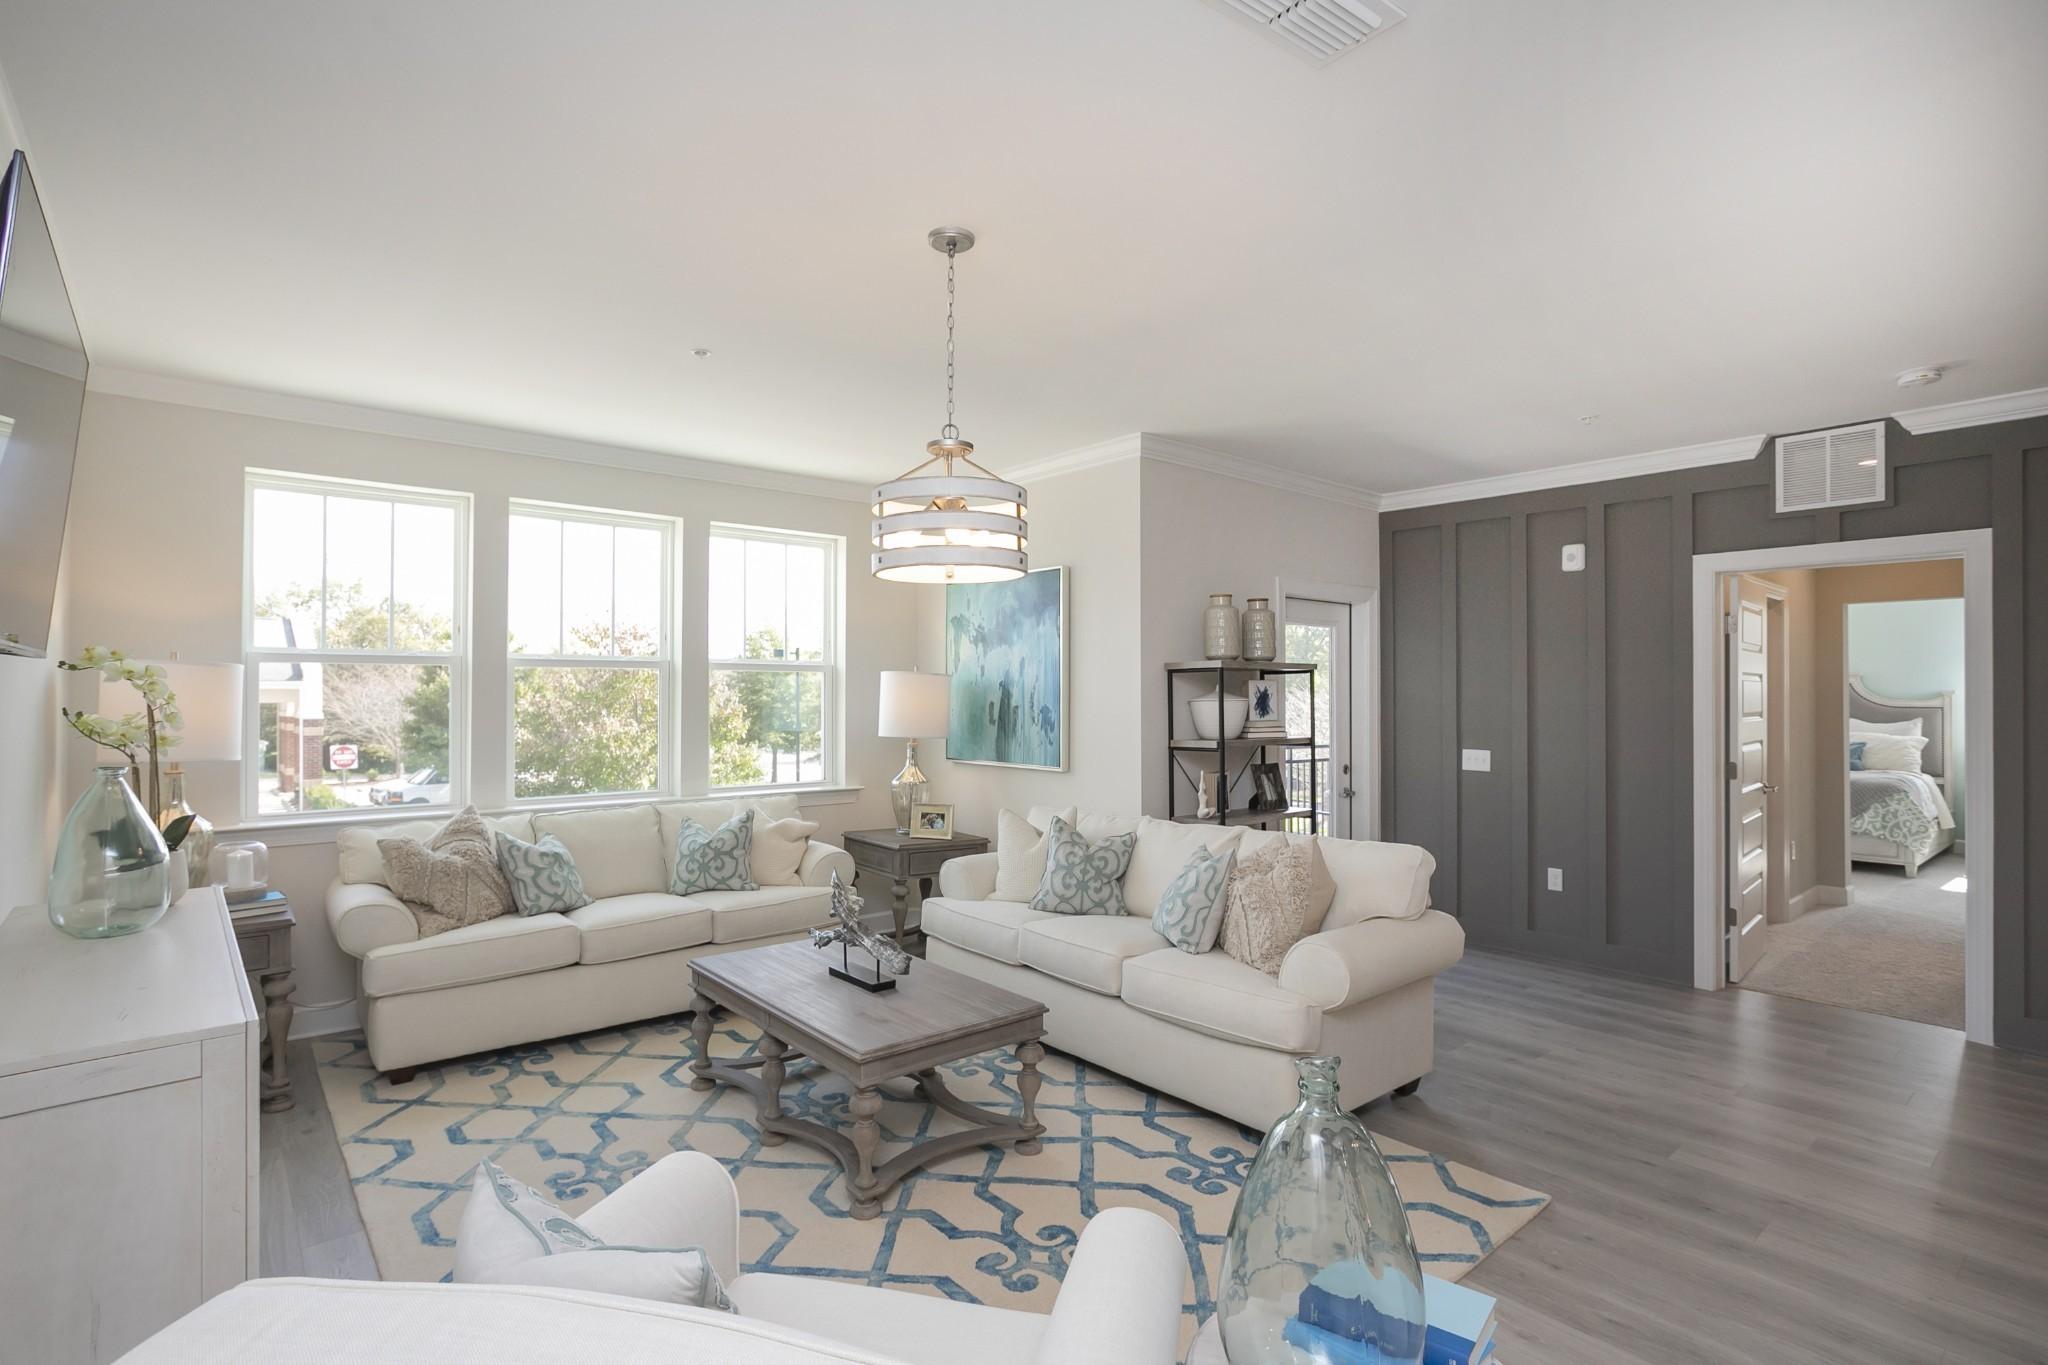 141 Saundersville Rd. #2306 Property Photo - Hendersonville, TN real estate listing